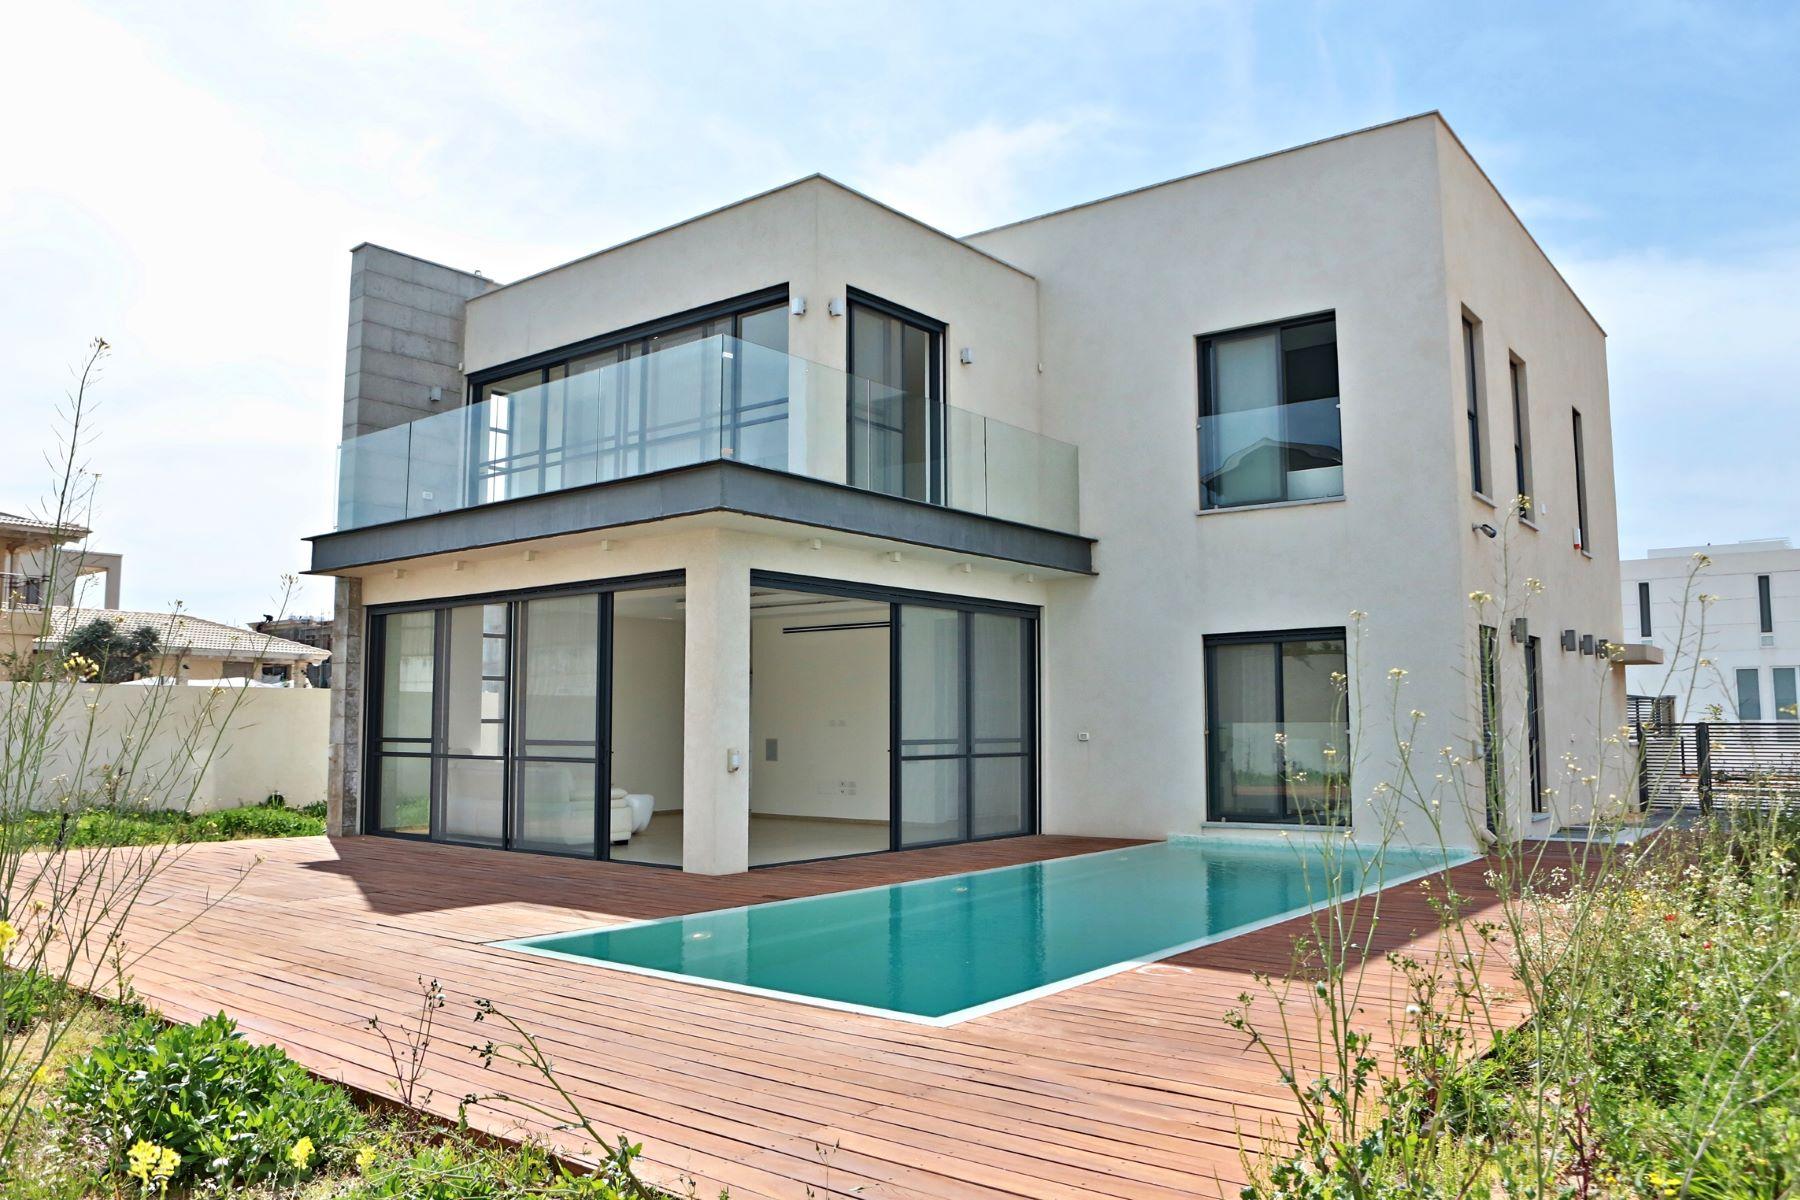 Single Family Home for Sale at Exquisite Classic Style Villa in Caesarea Caesarea, Israel 308890 Israel